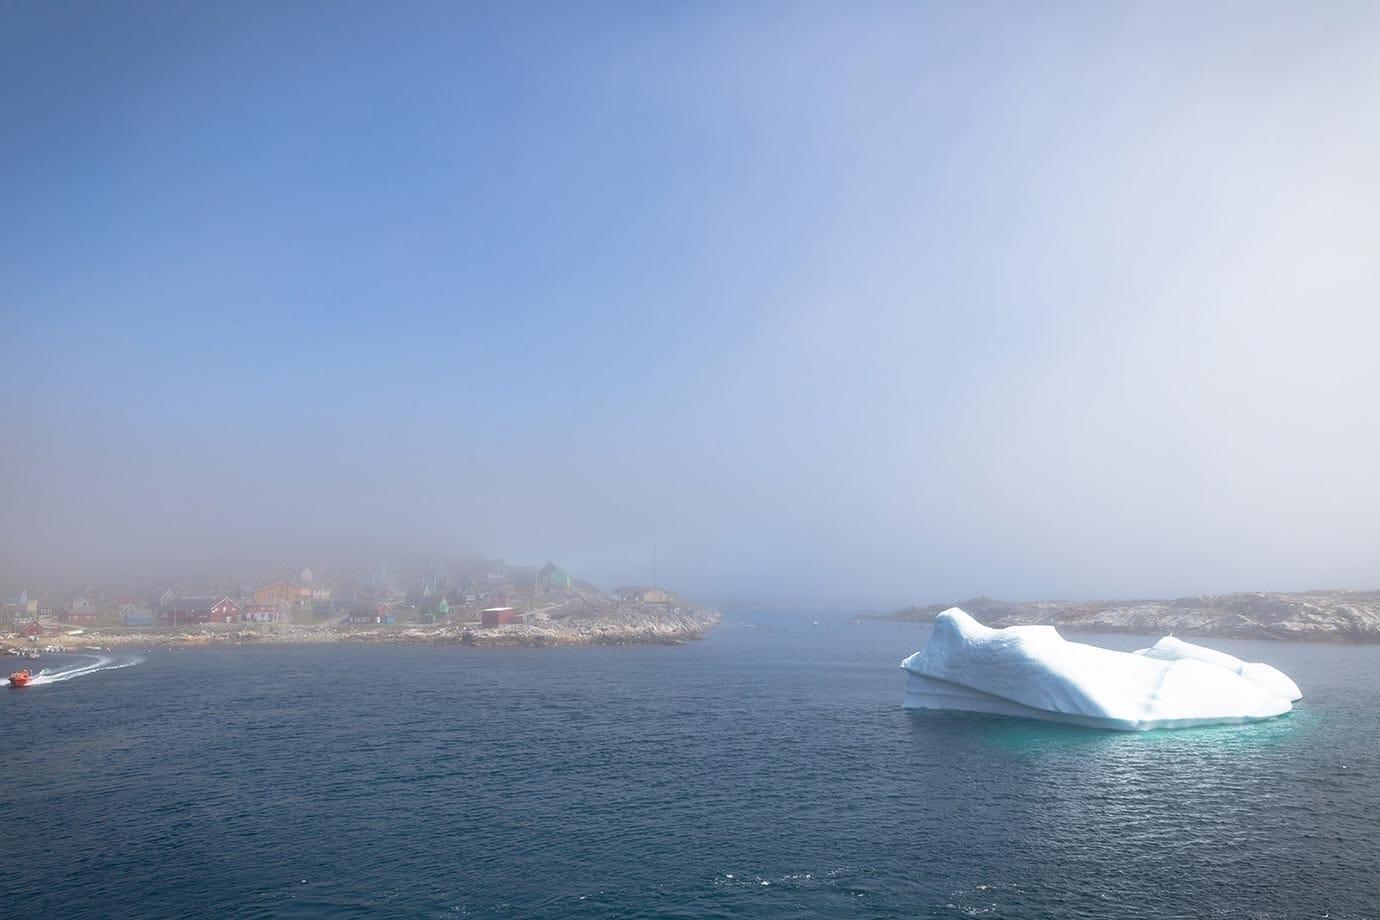 Huge iceberg in Greenland